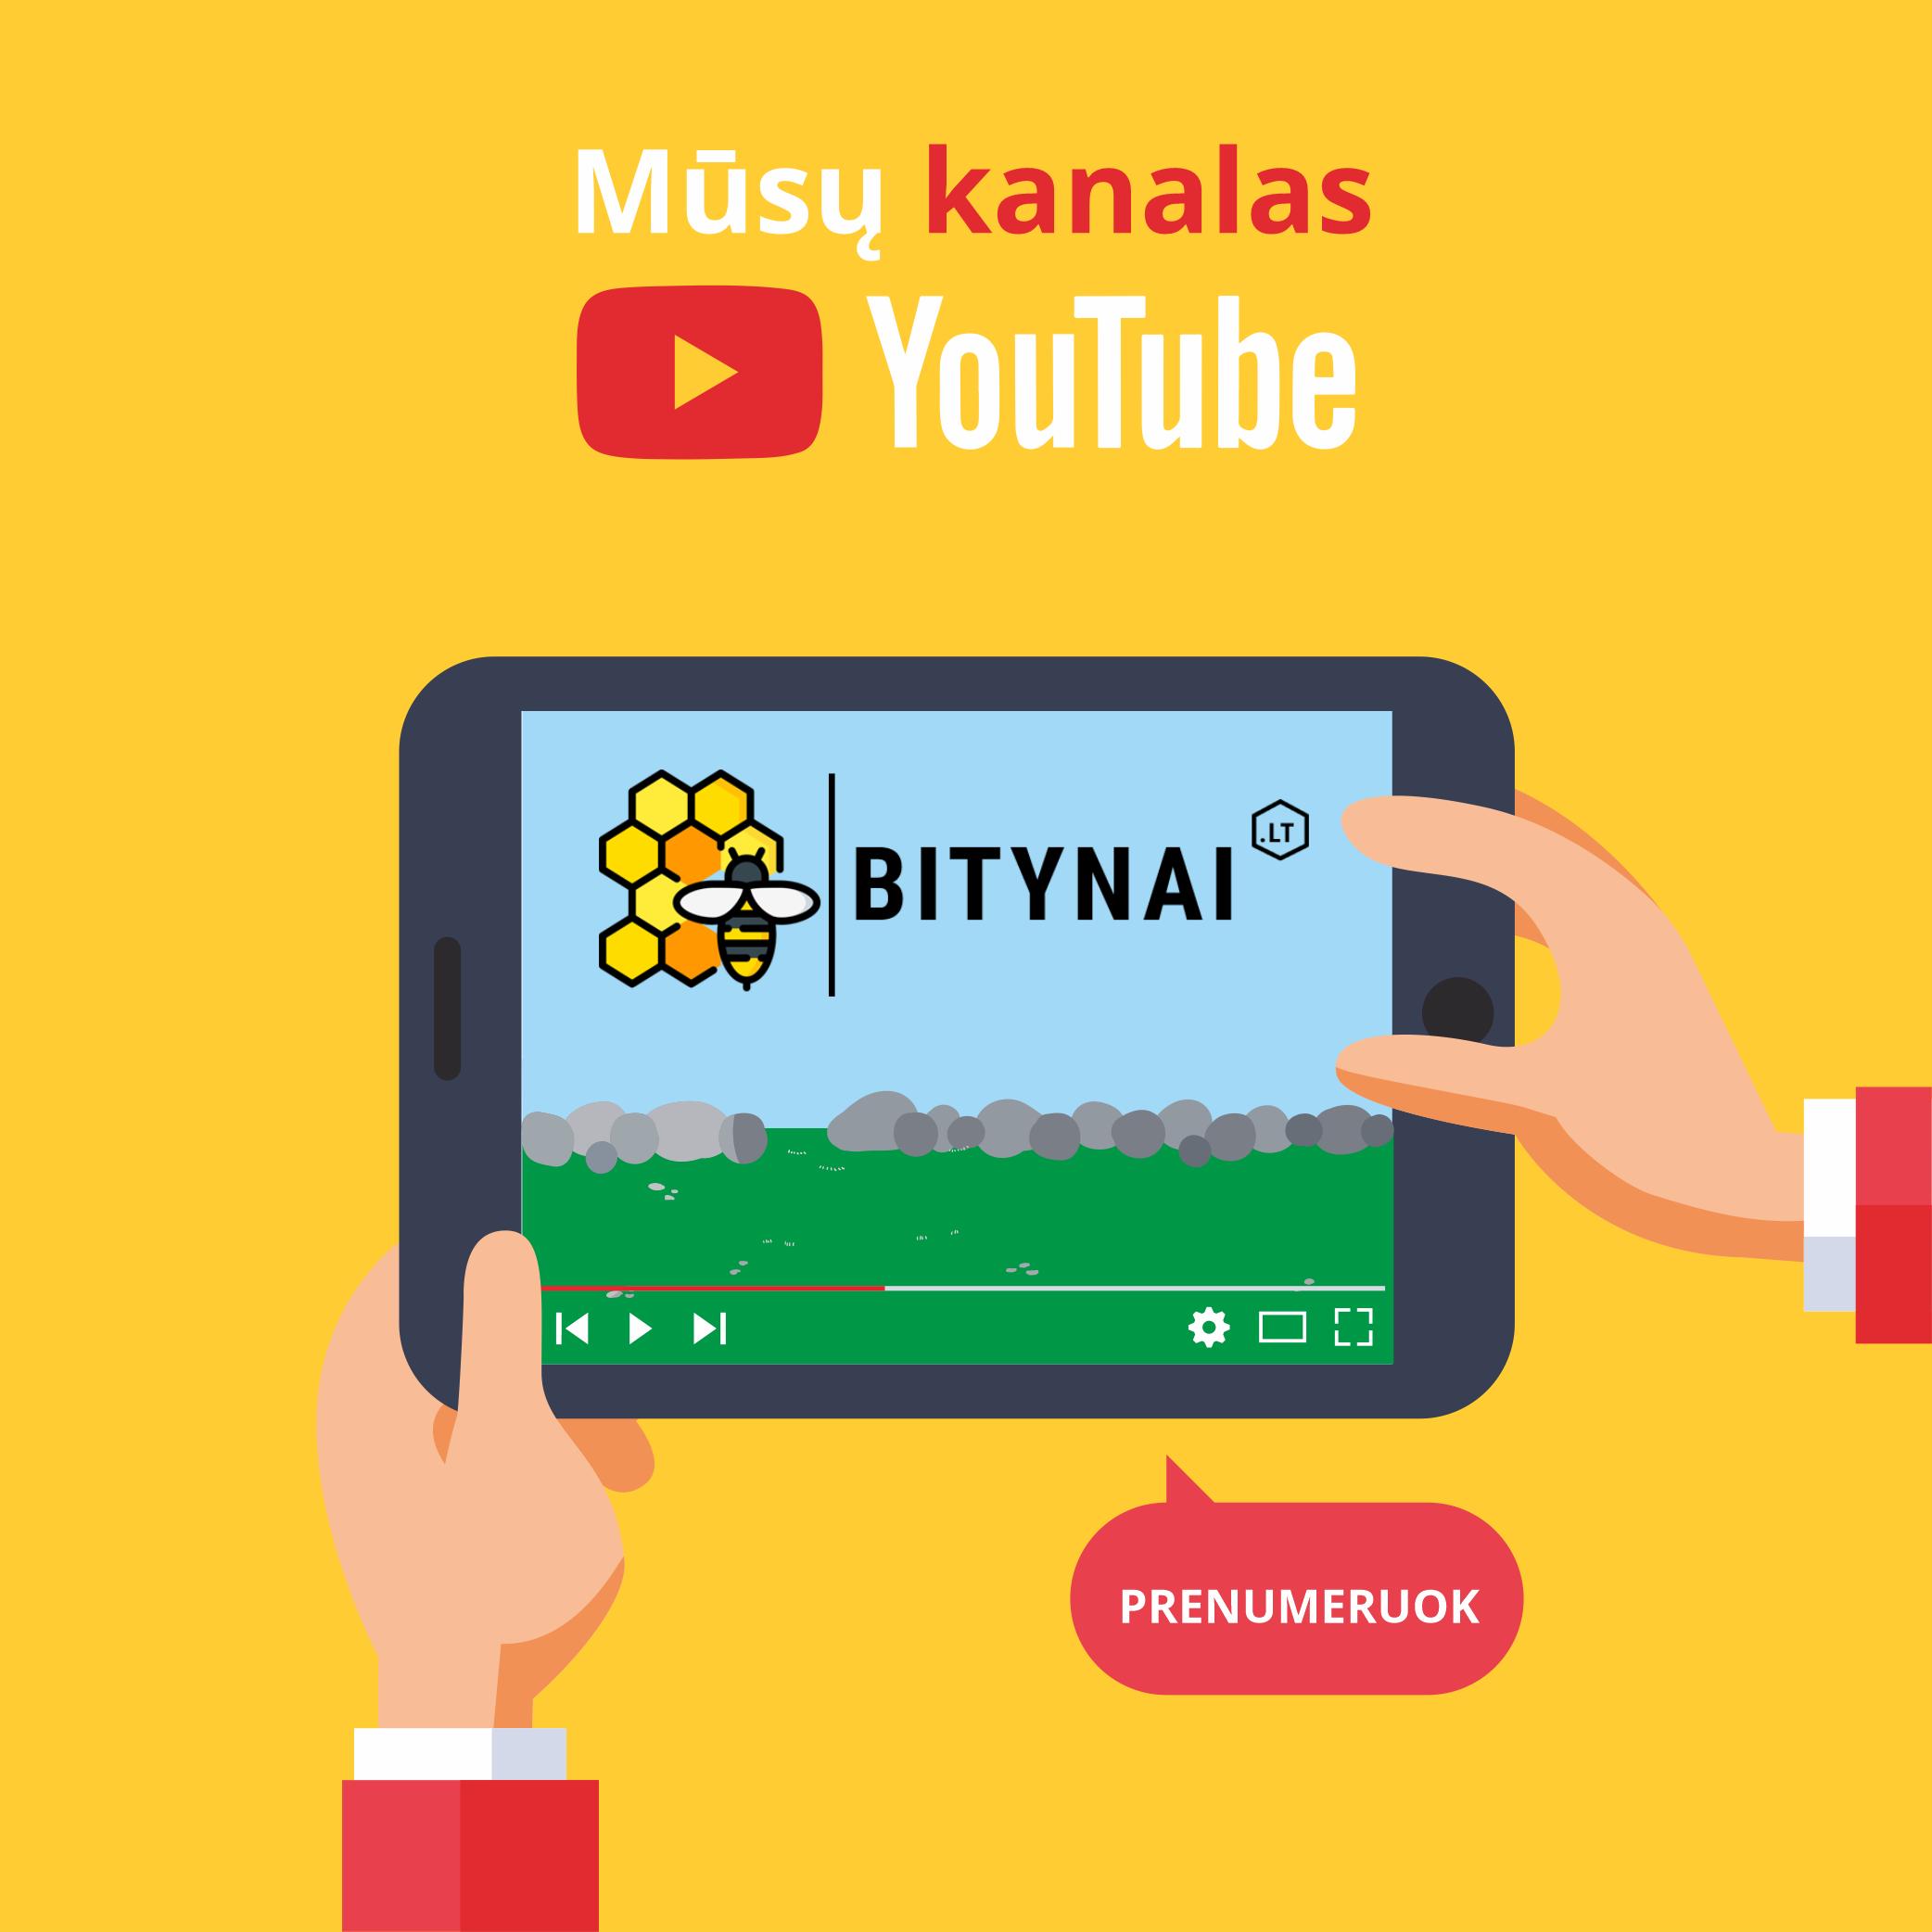 Youtube kanalas Bitynai.lt